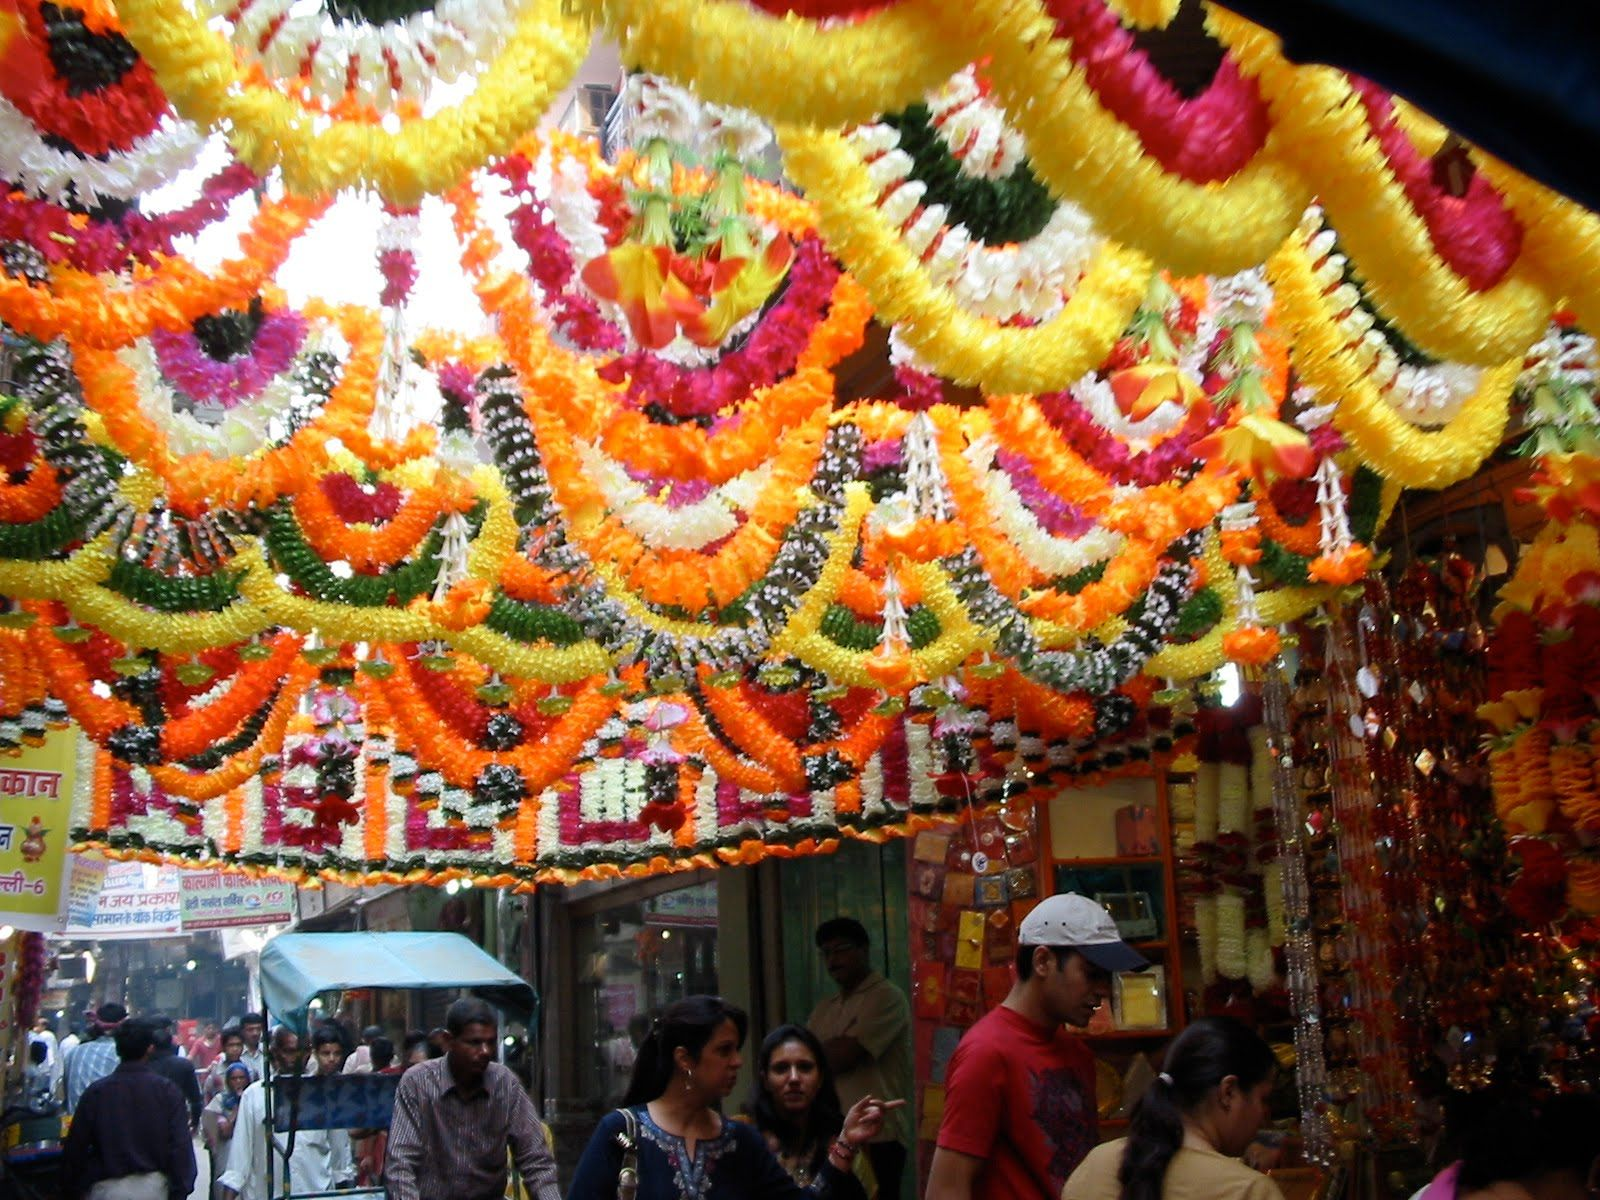 Diwali-Toran-Wallpapers.JPG (1600×1200) | Diwali | Pinterest ... for Indian Hanging Decorations  49jwn